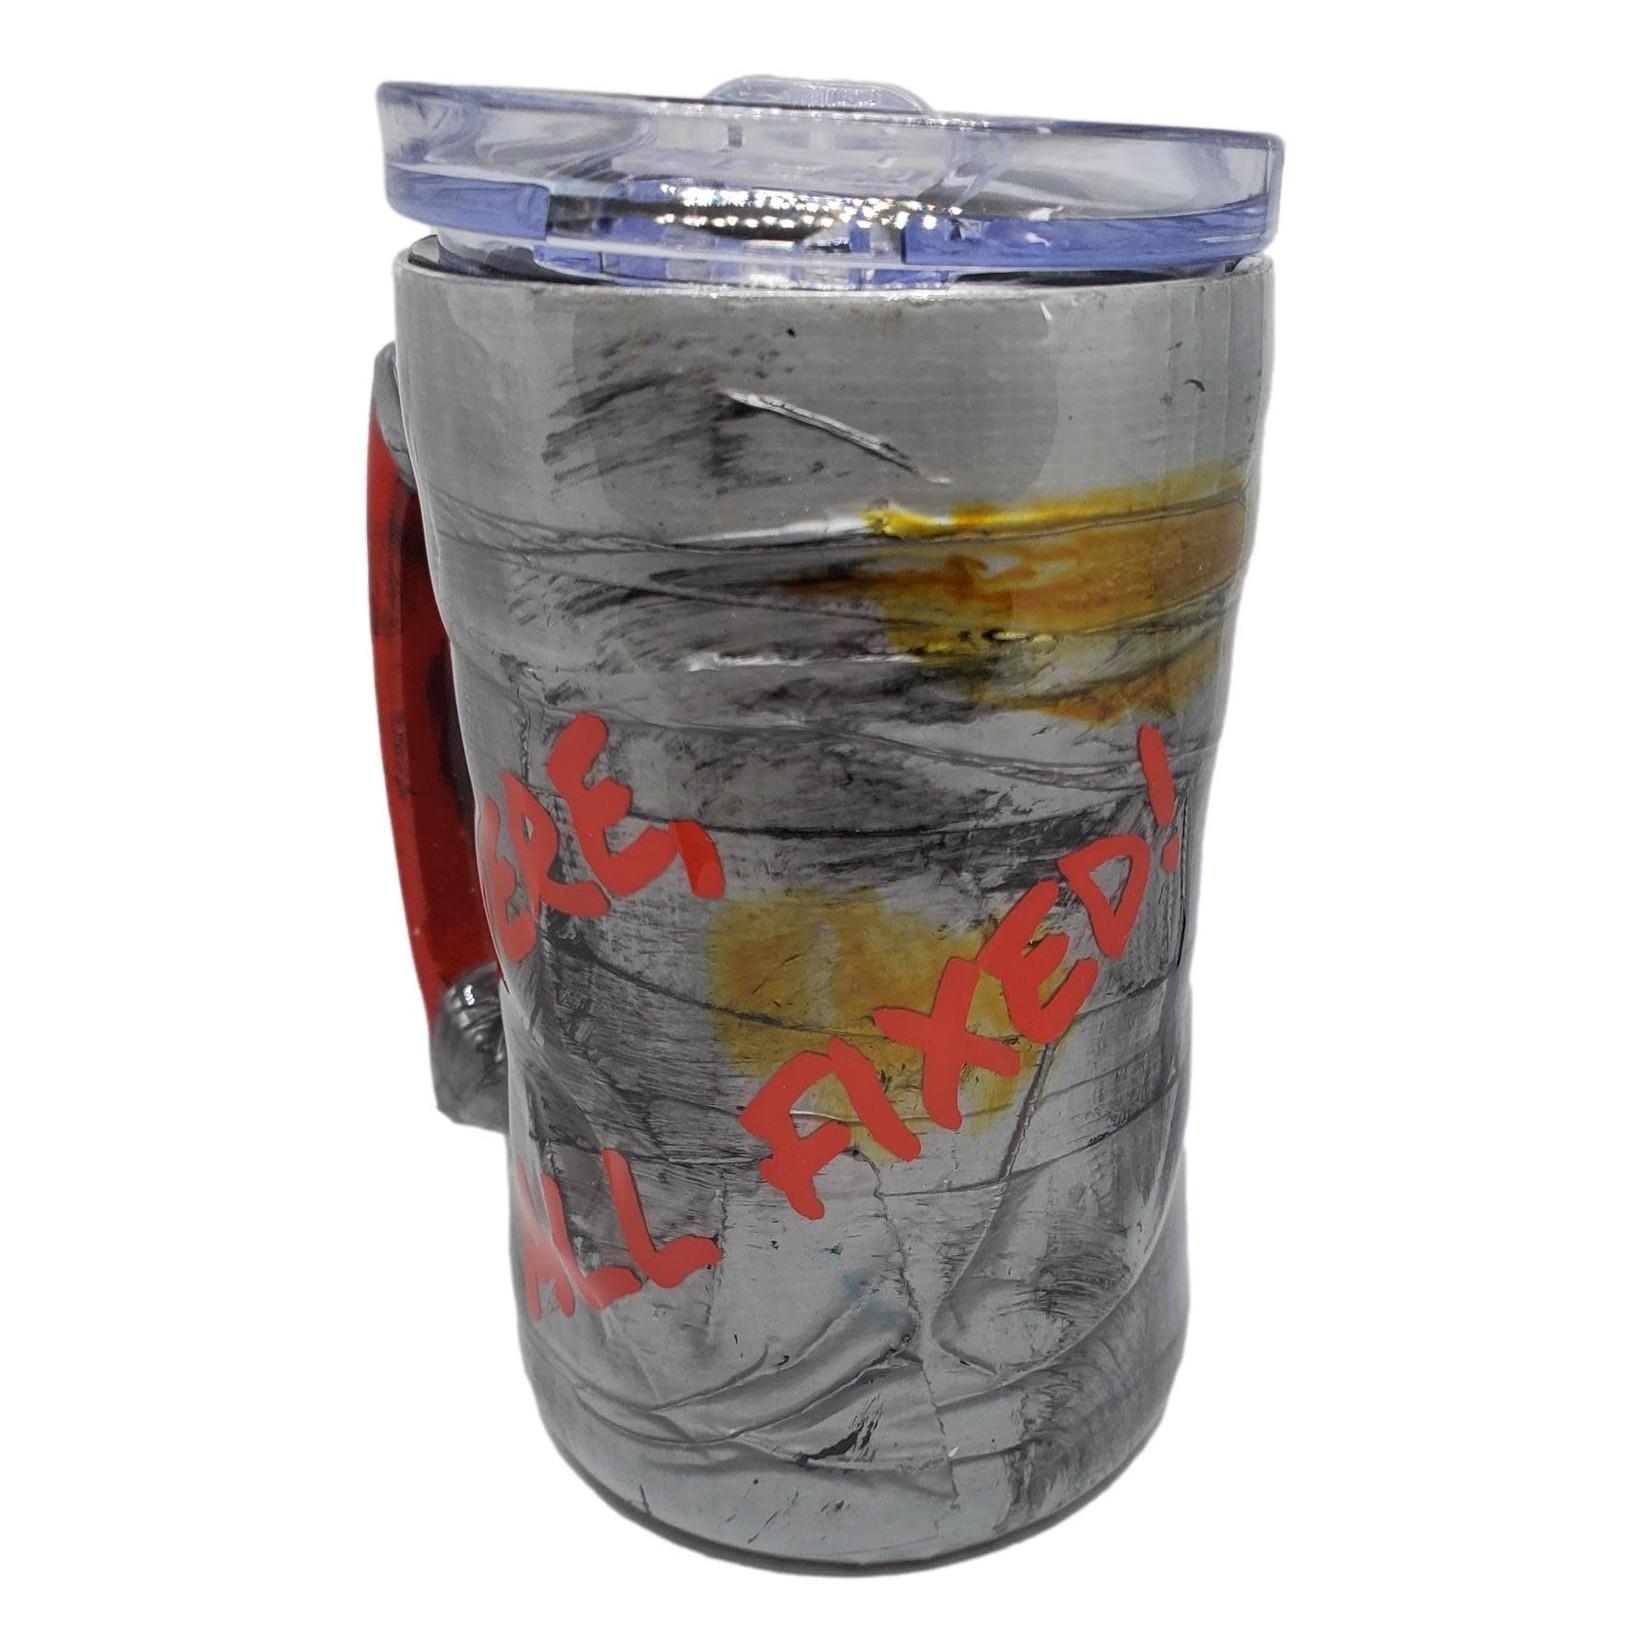 East Coast Sirens Duct Tape Beer Stein